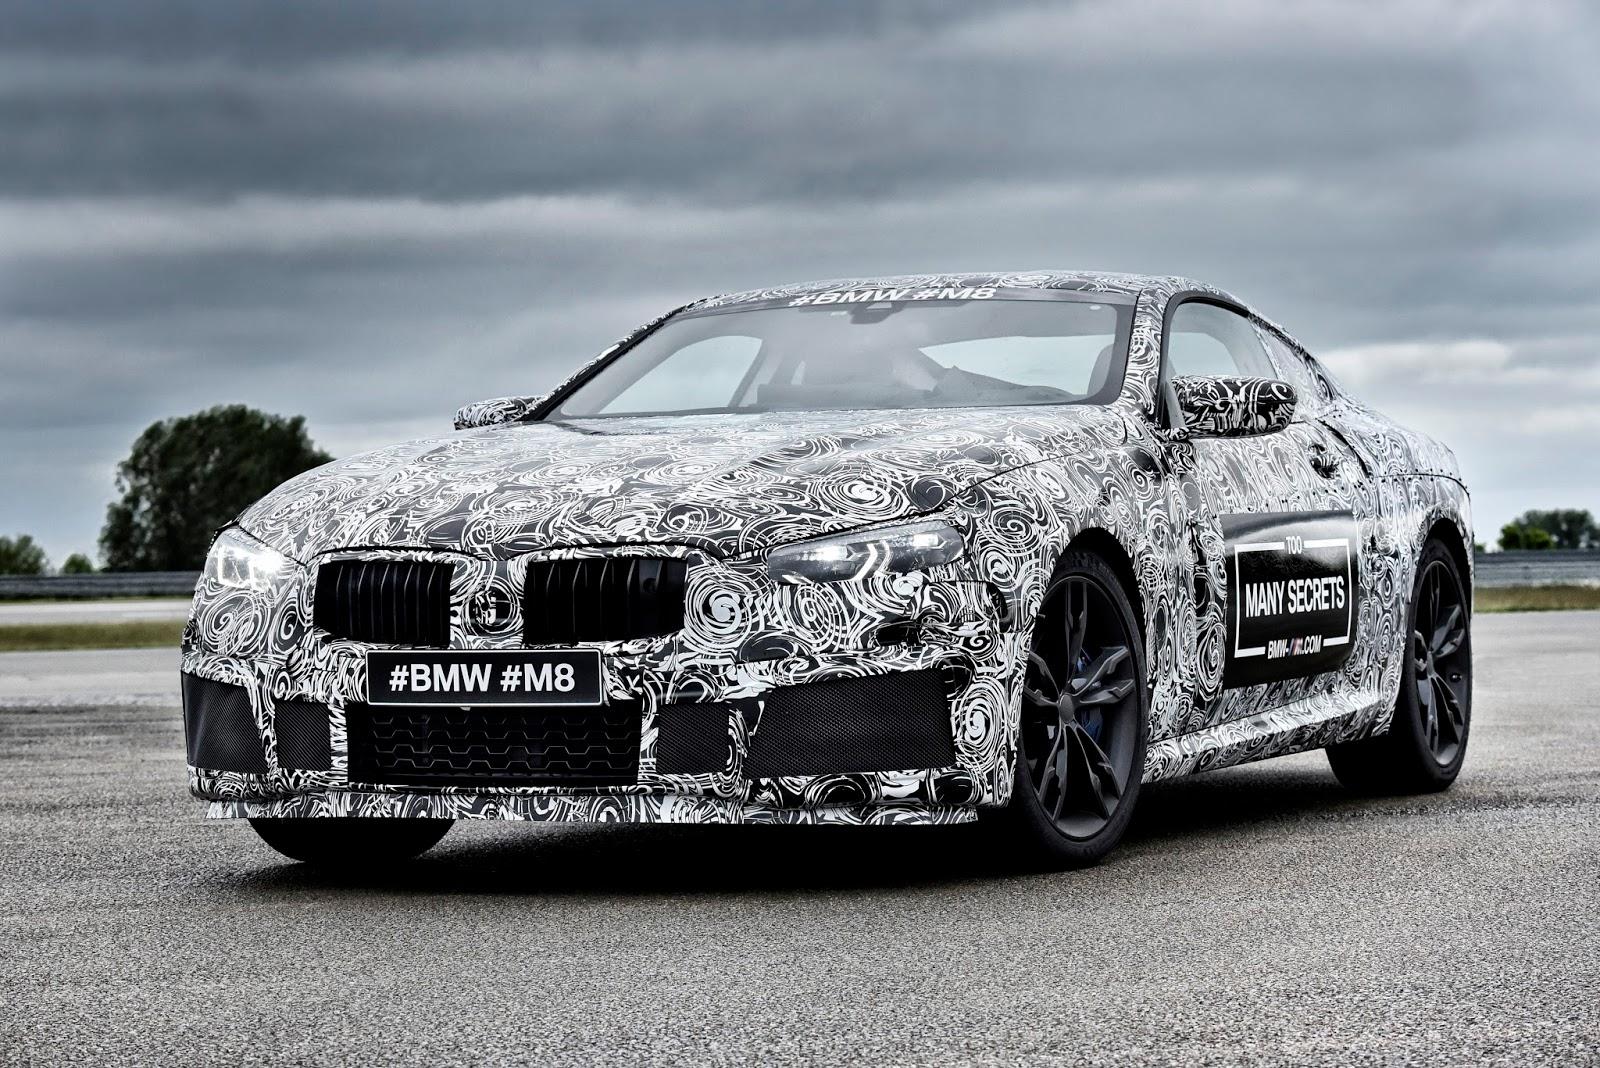 P90260927 highRes bmw m8 prototype 05 1 1 H ναυαρχίδα της BMW, η M8 θα είναι οκτακύλινδρη BMW, BMW Concept, BMW Concept 8 Series, BMW M, BMW M Performance, BMW M8